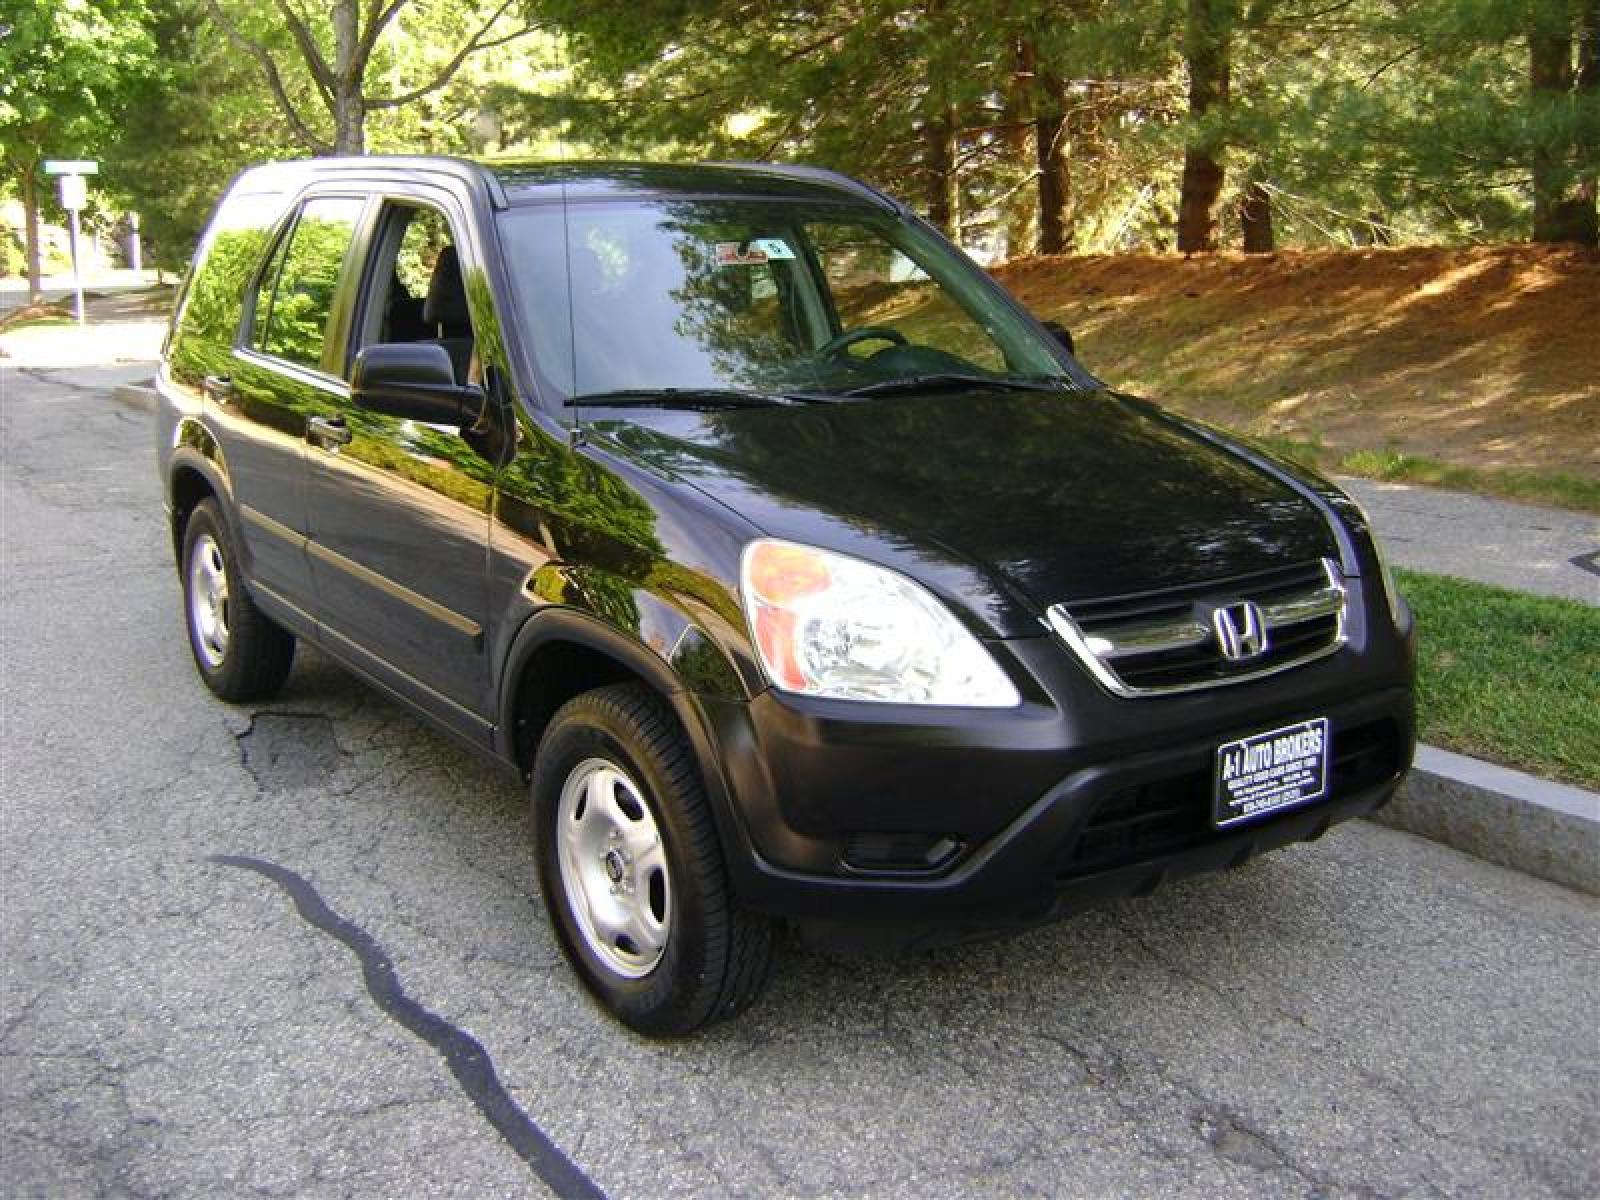 2003 Honda Cr V Information And Photos Zombiedrive 800 1024 1280 1600 Origin